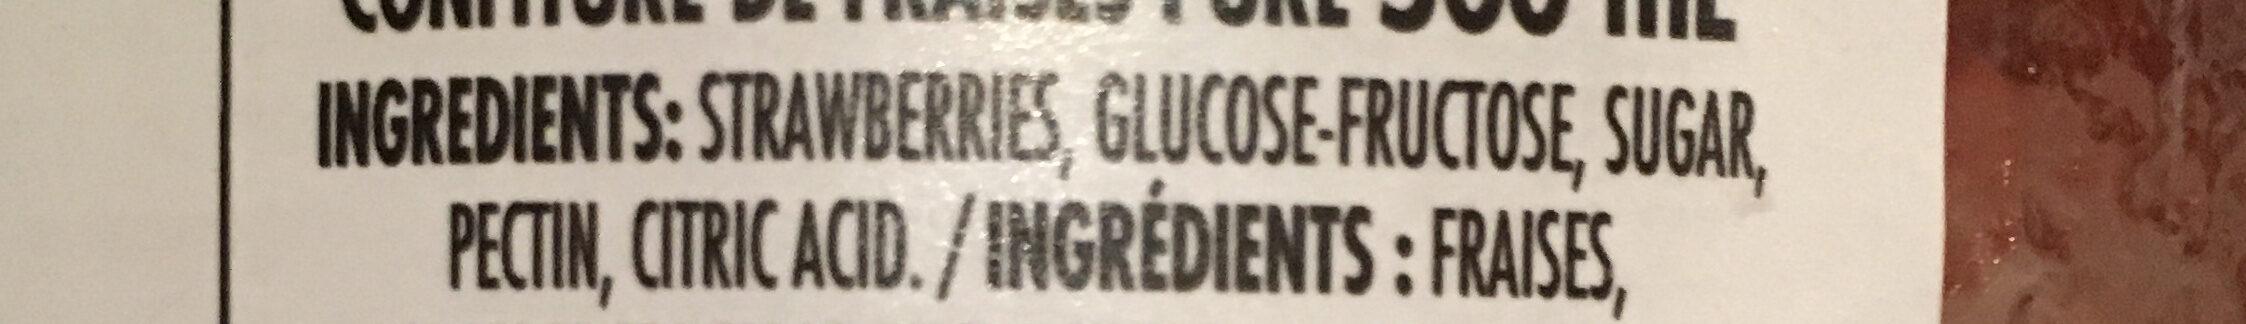 Confiture (fraise) - Ingredients - en